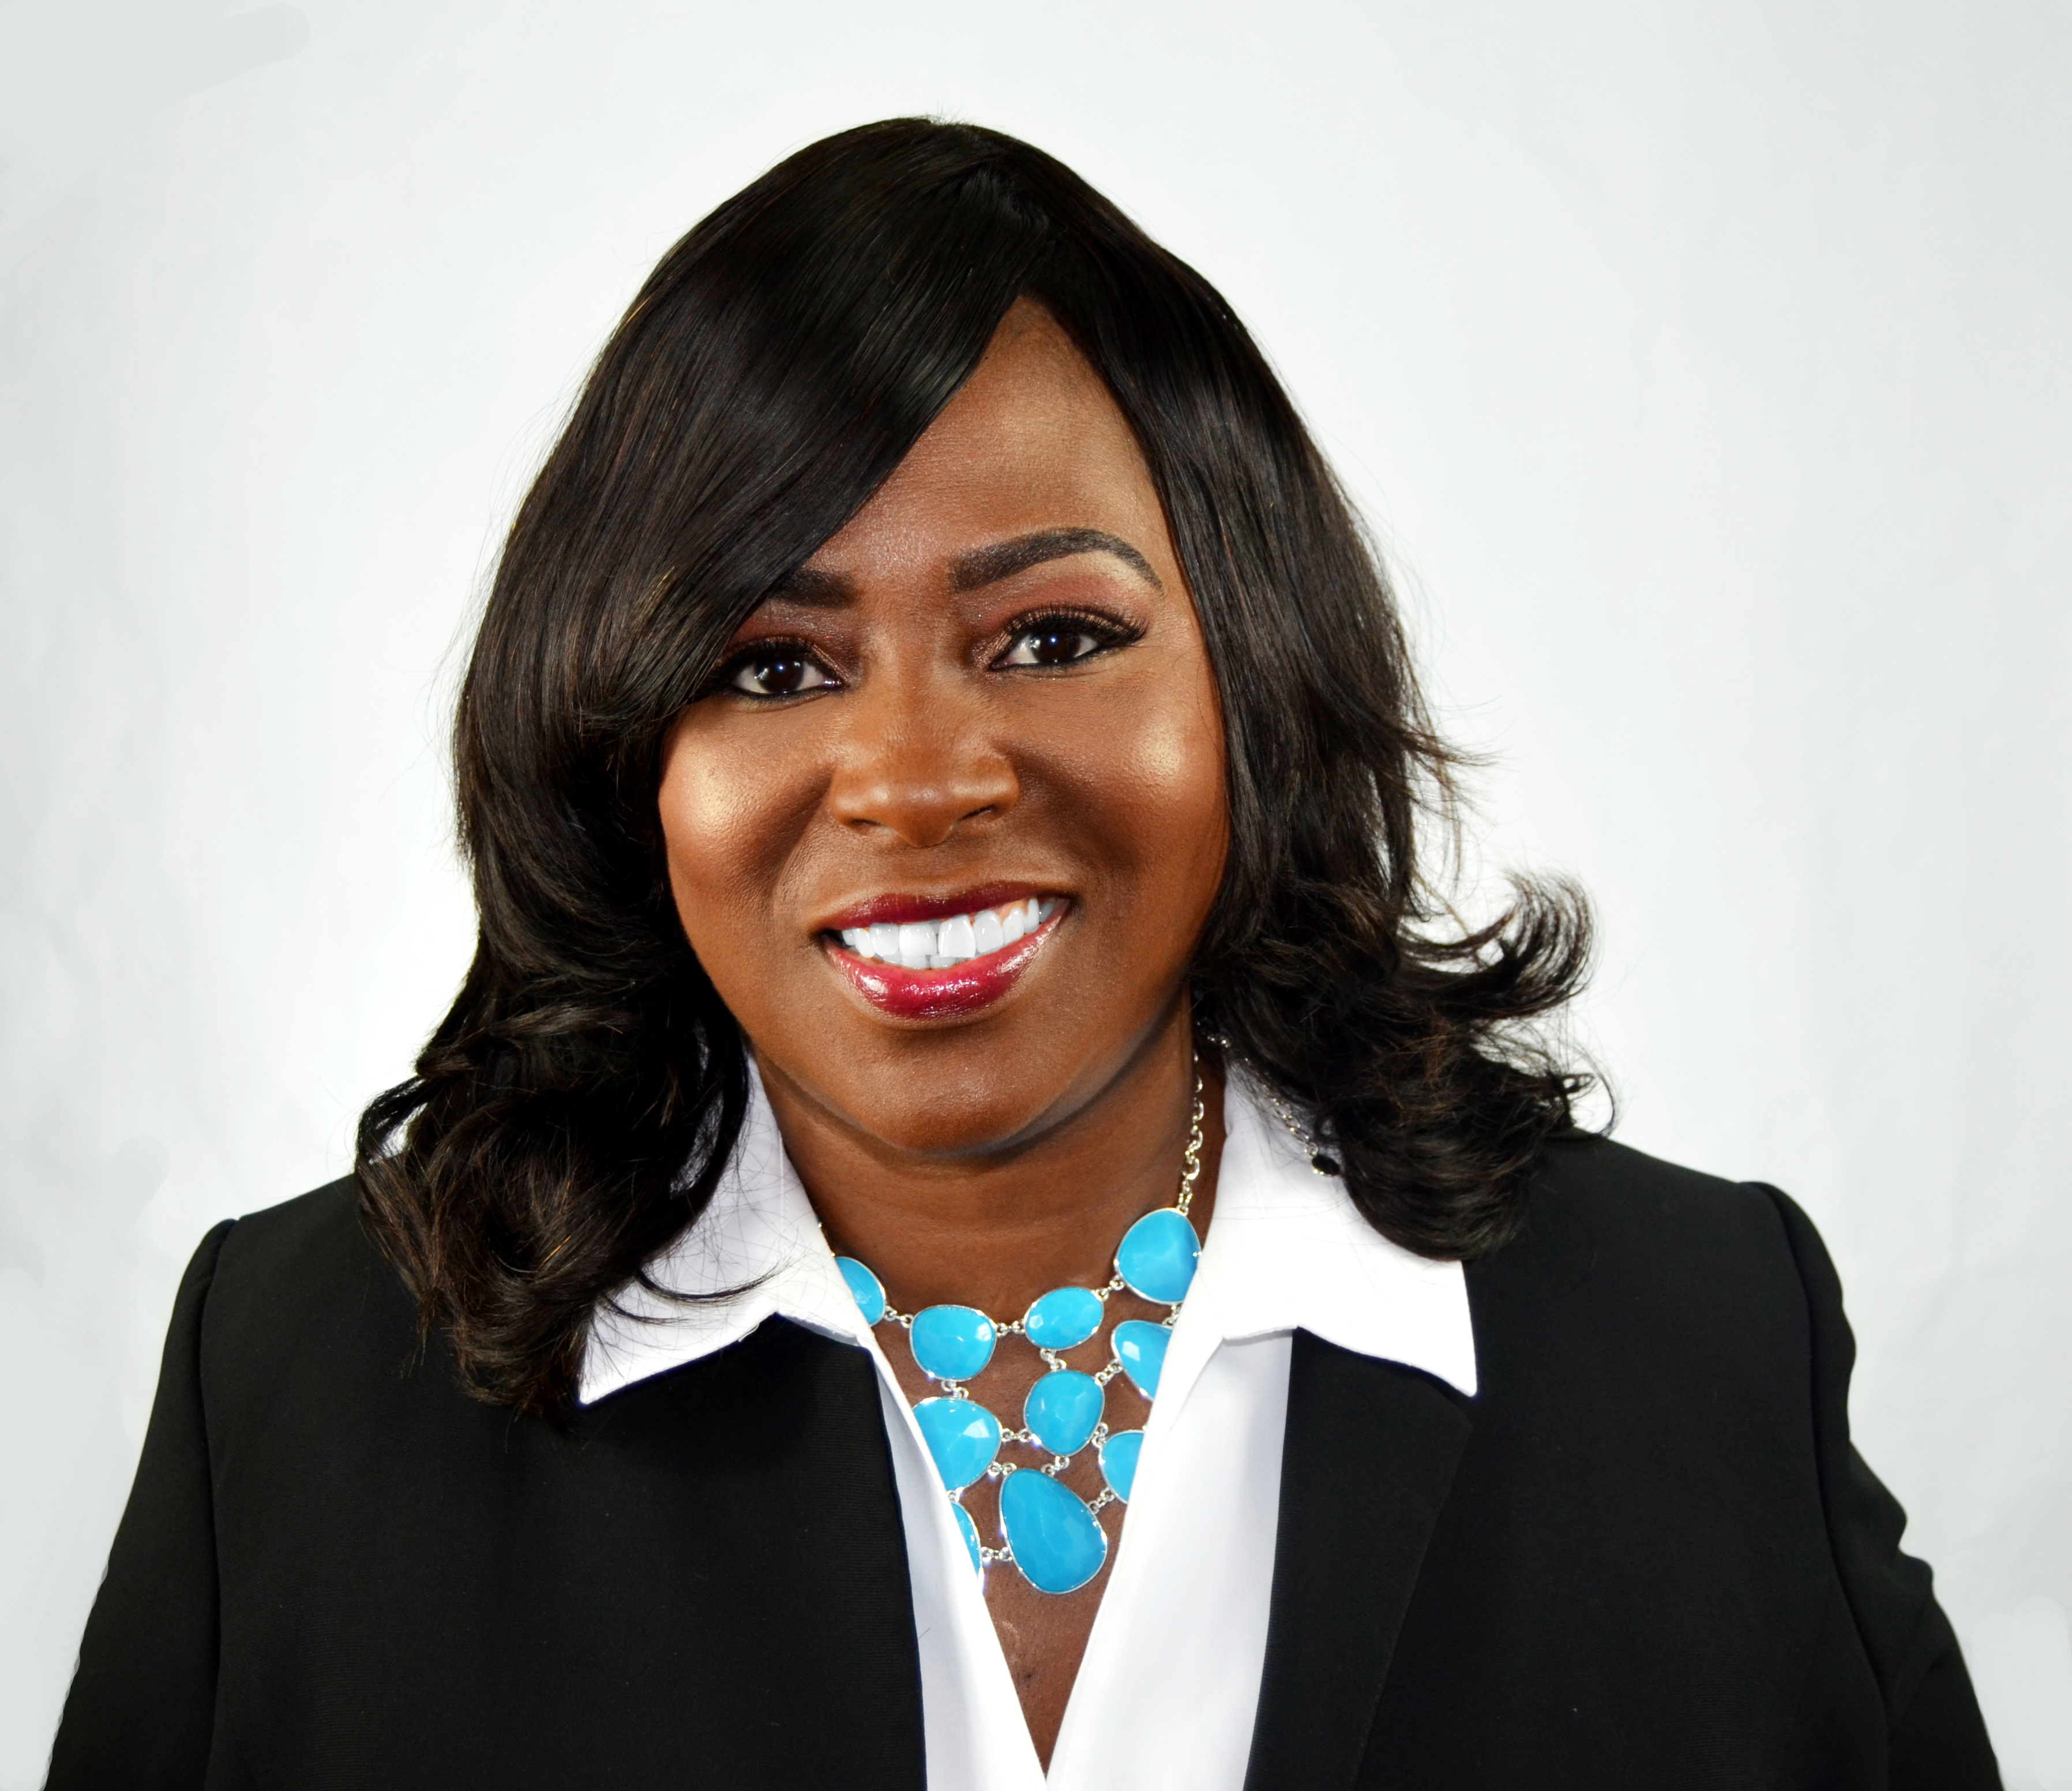 Dr. Marlene Carson